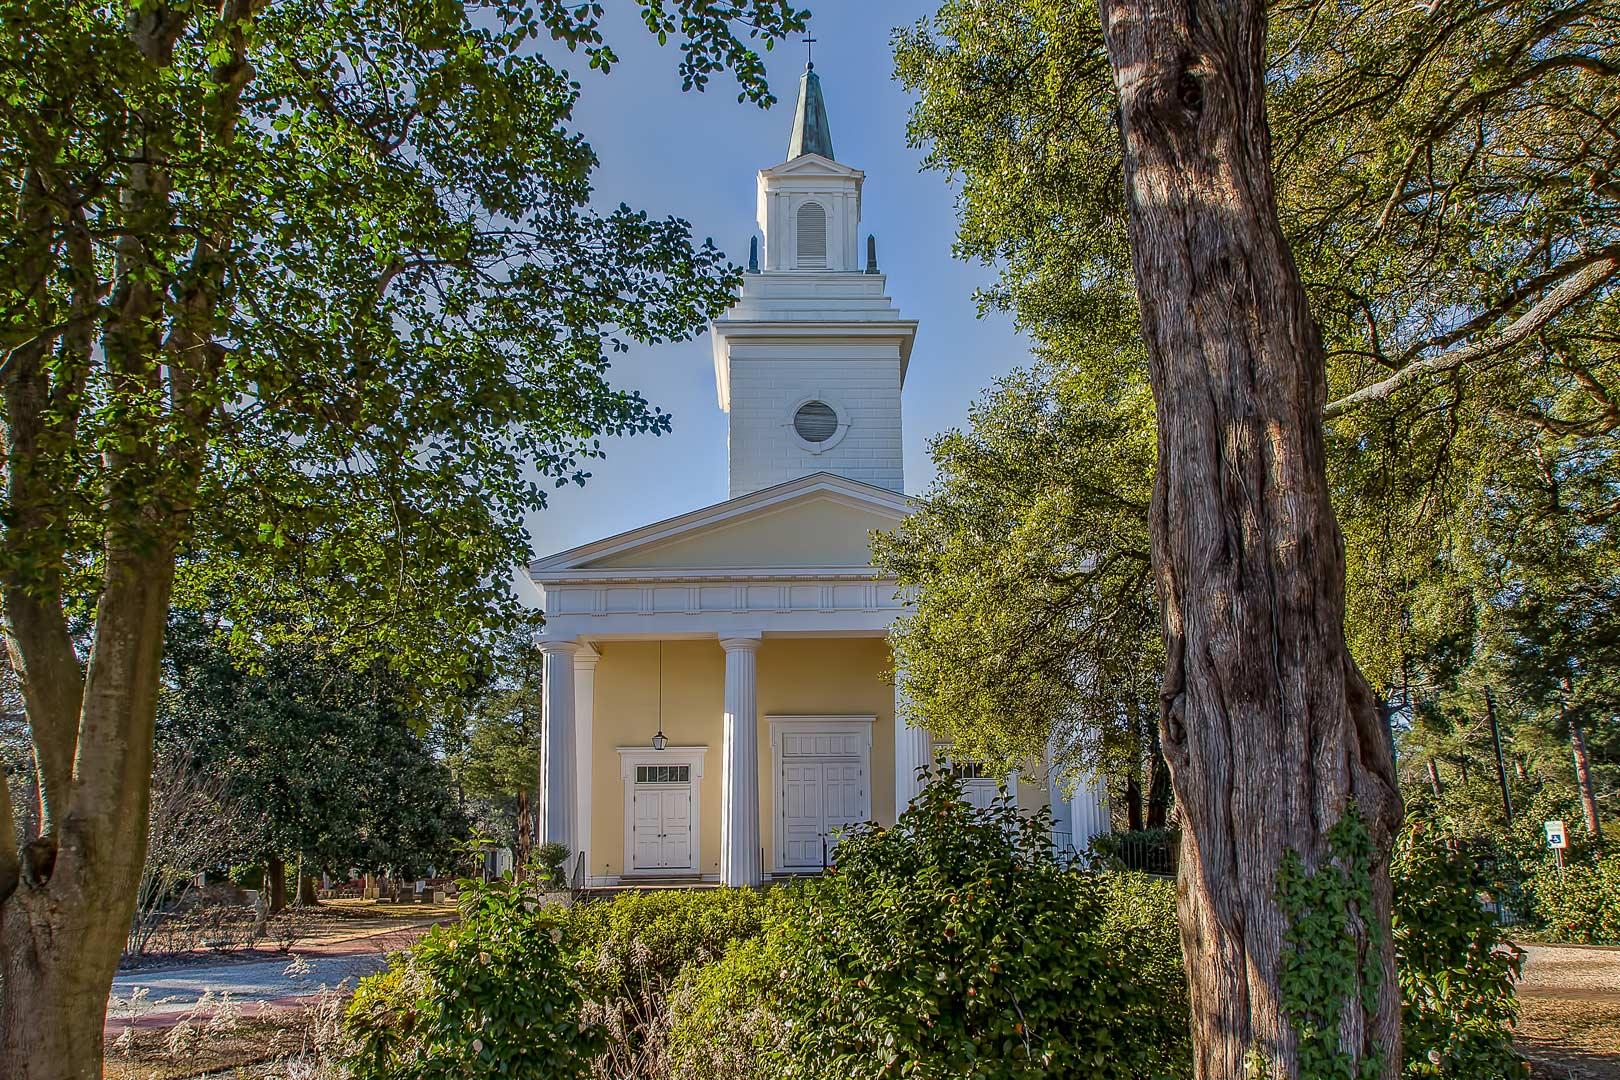 St. Thaddeus in Aiken, Facade